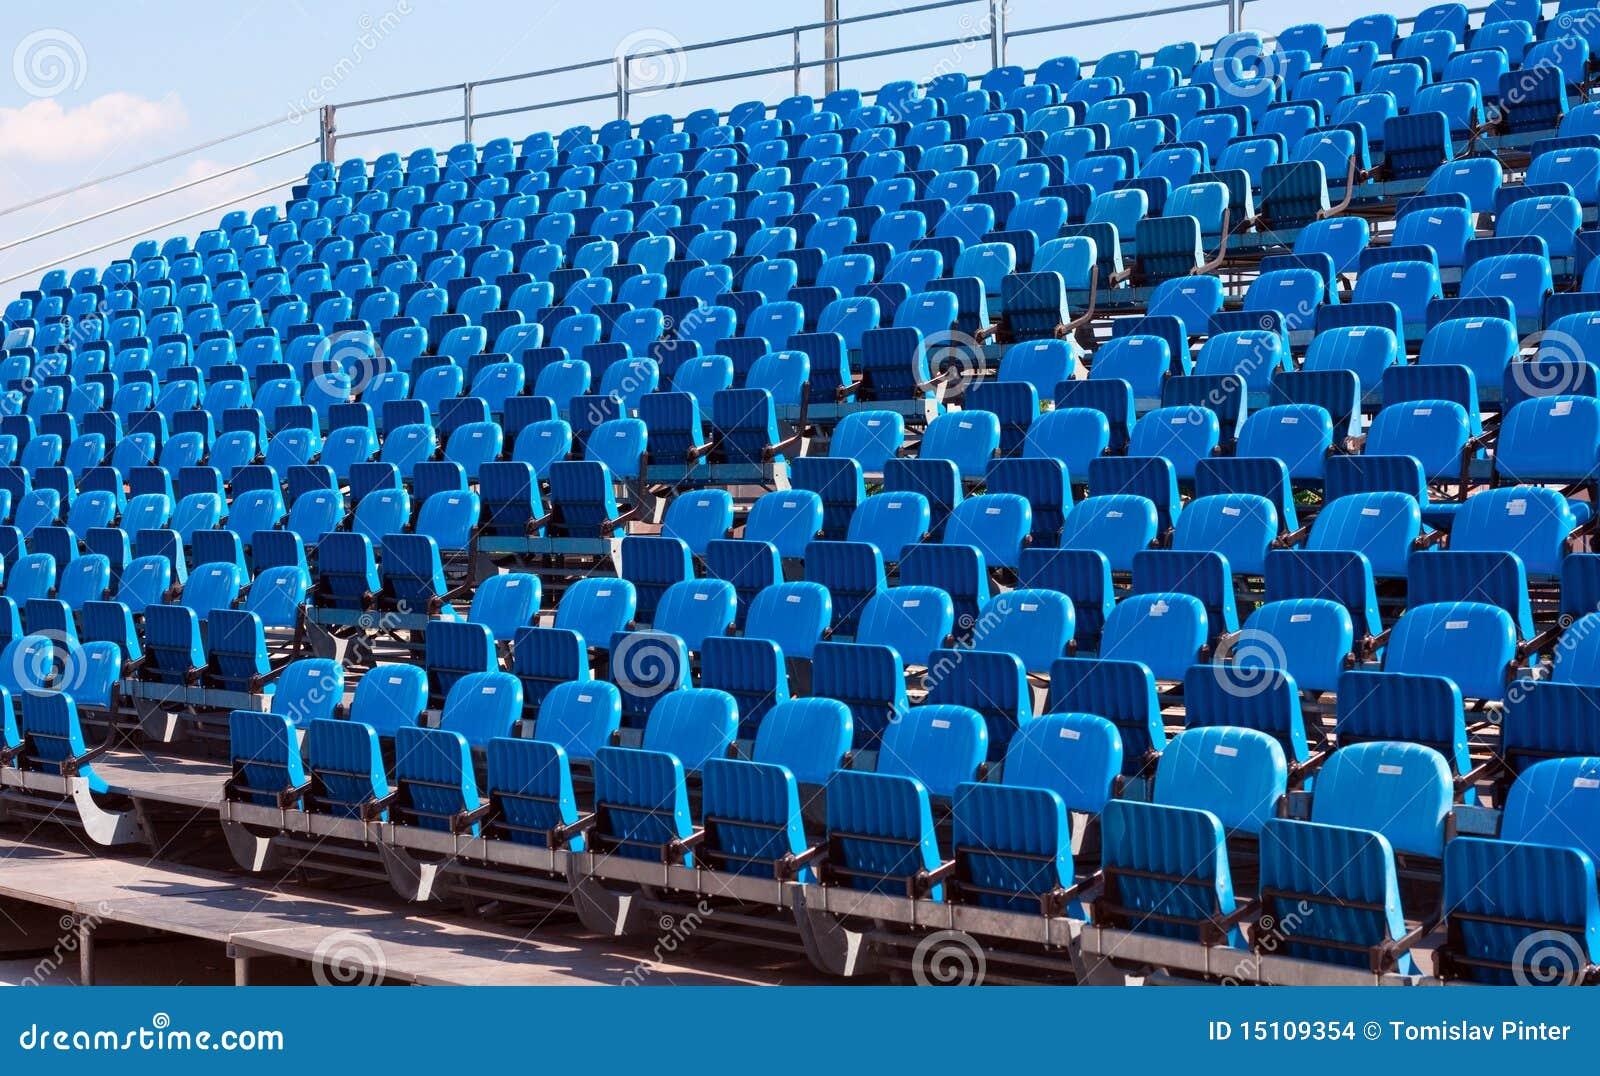 stadium chairs stock images - image: 15109354